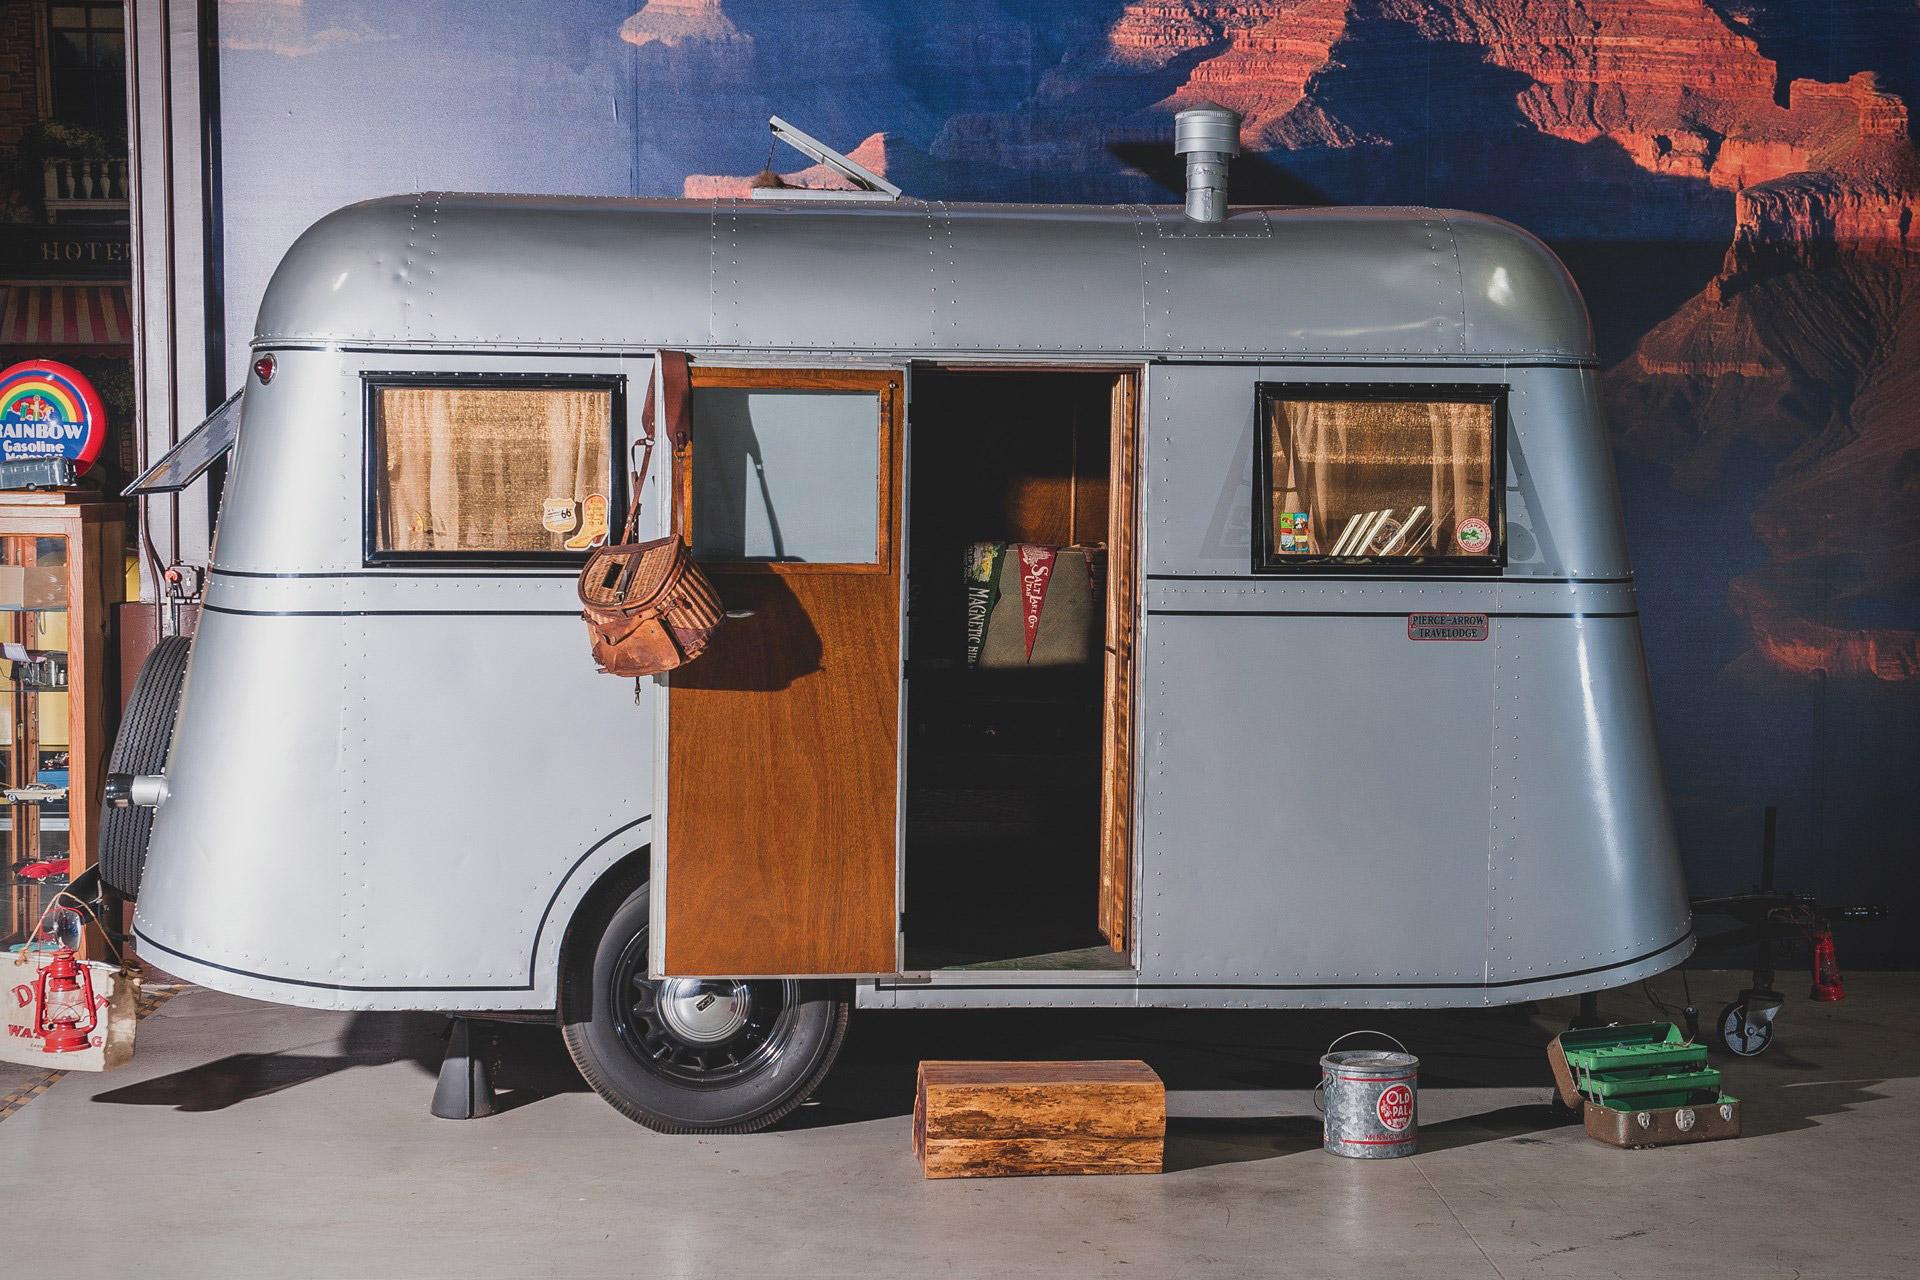 1937 Pierce-Arrow Model C Travelodge Camper